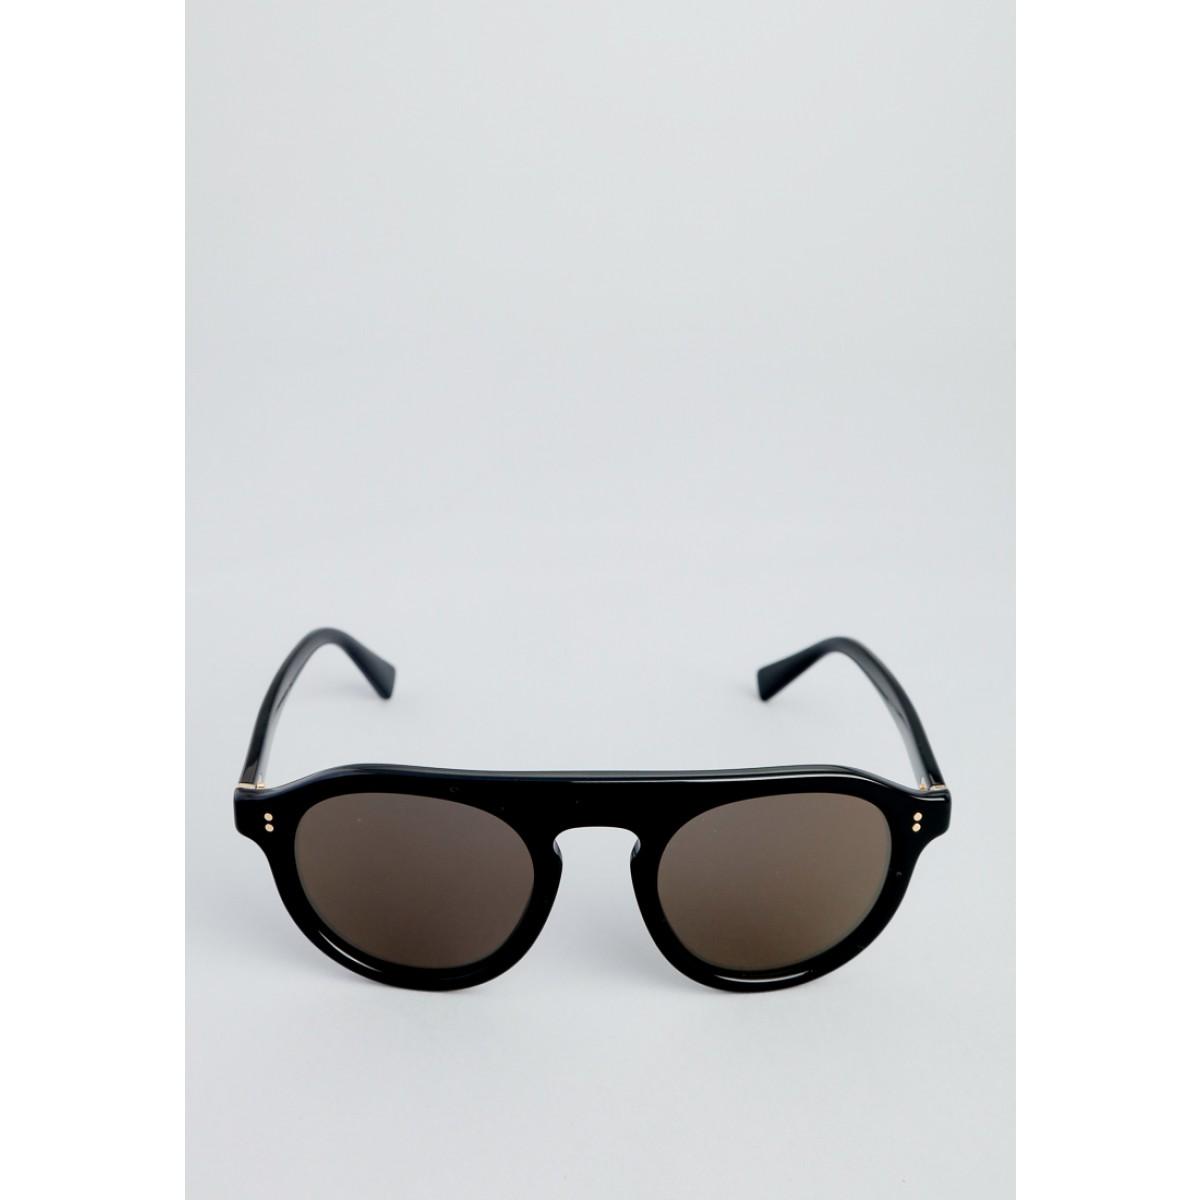 8c52a913972d Dolce   Gabbana Black Aviator Men Sunglasses DG4306-501 R5-50 - Sunglasses  - Fashion World